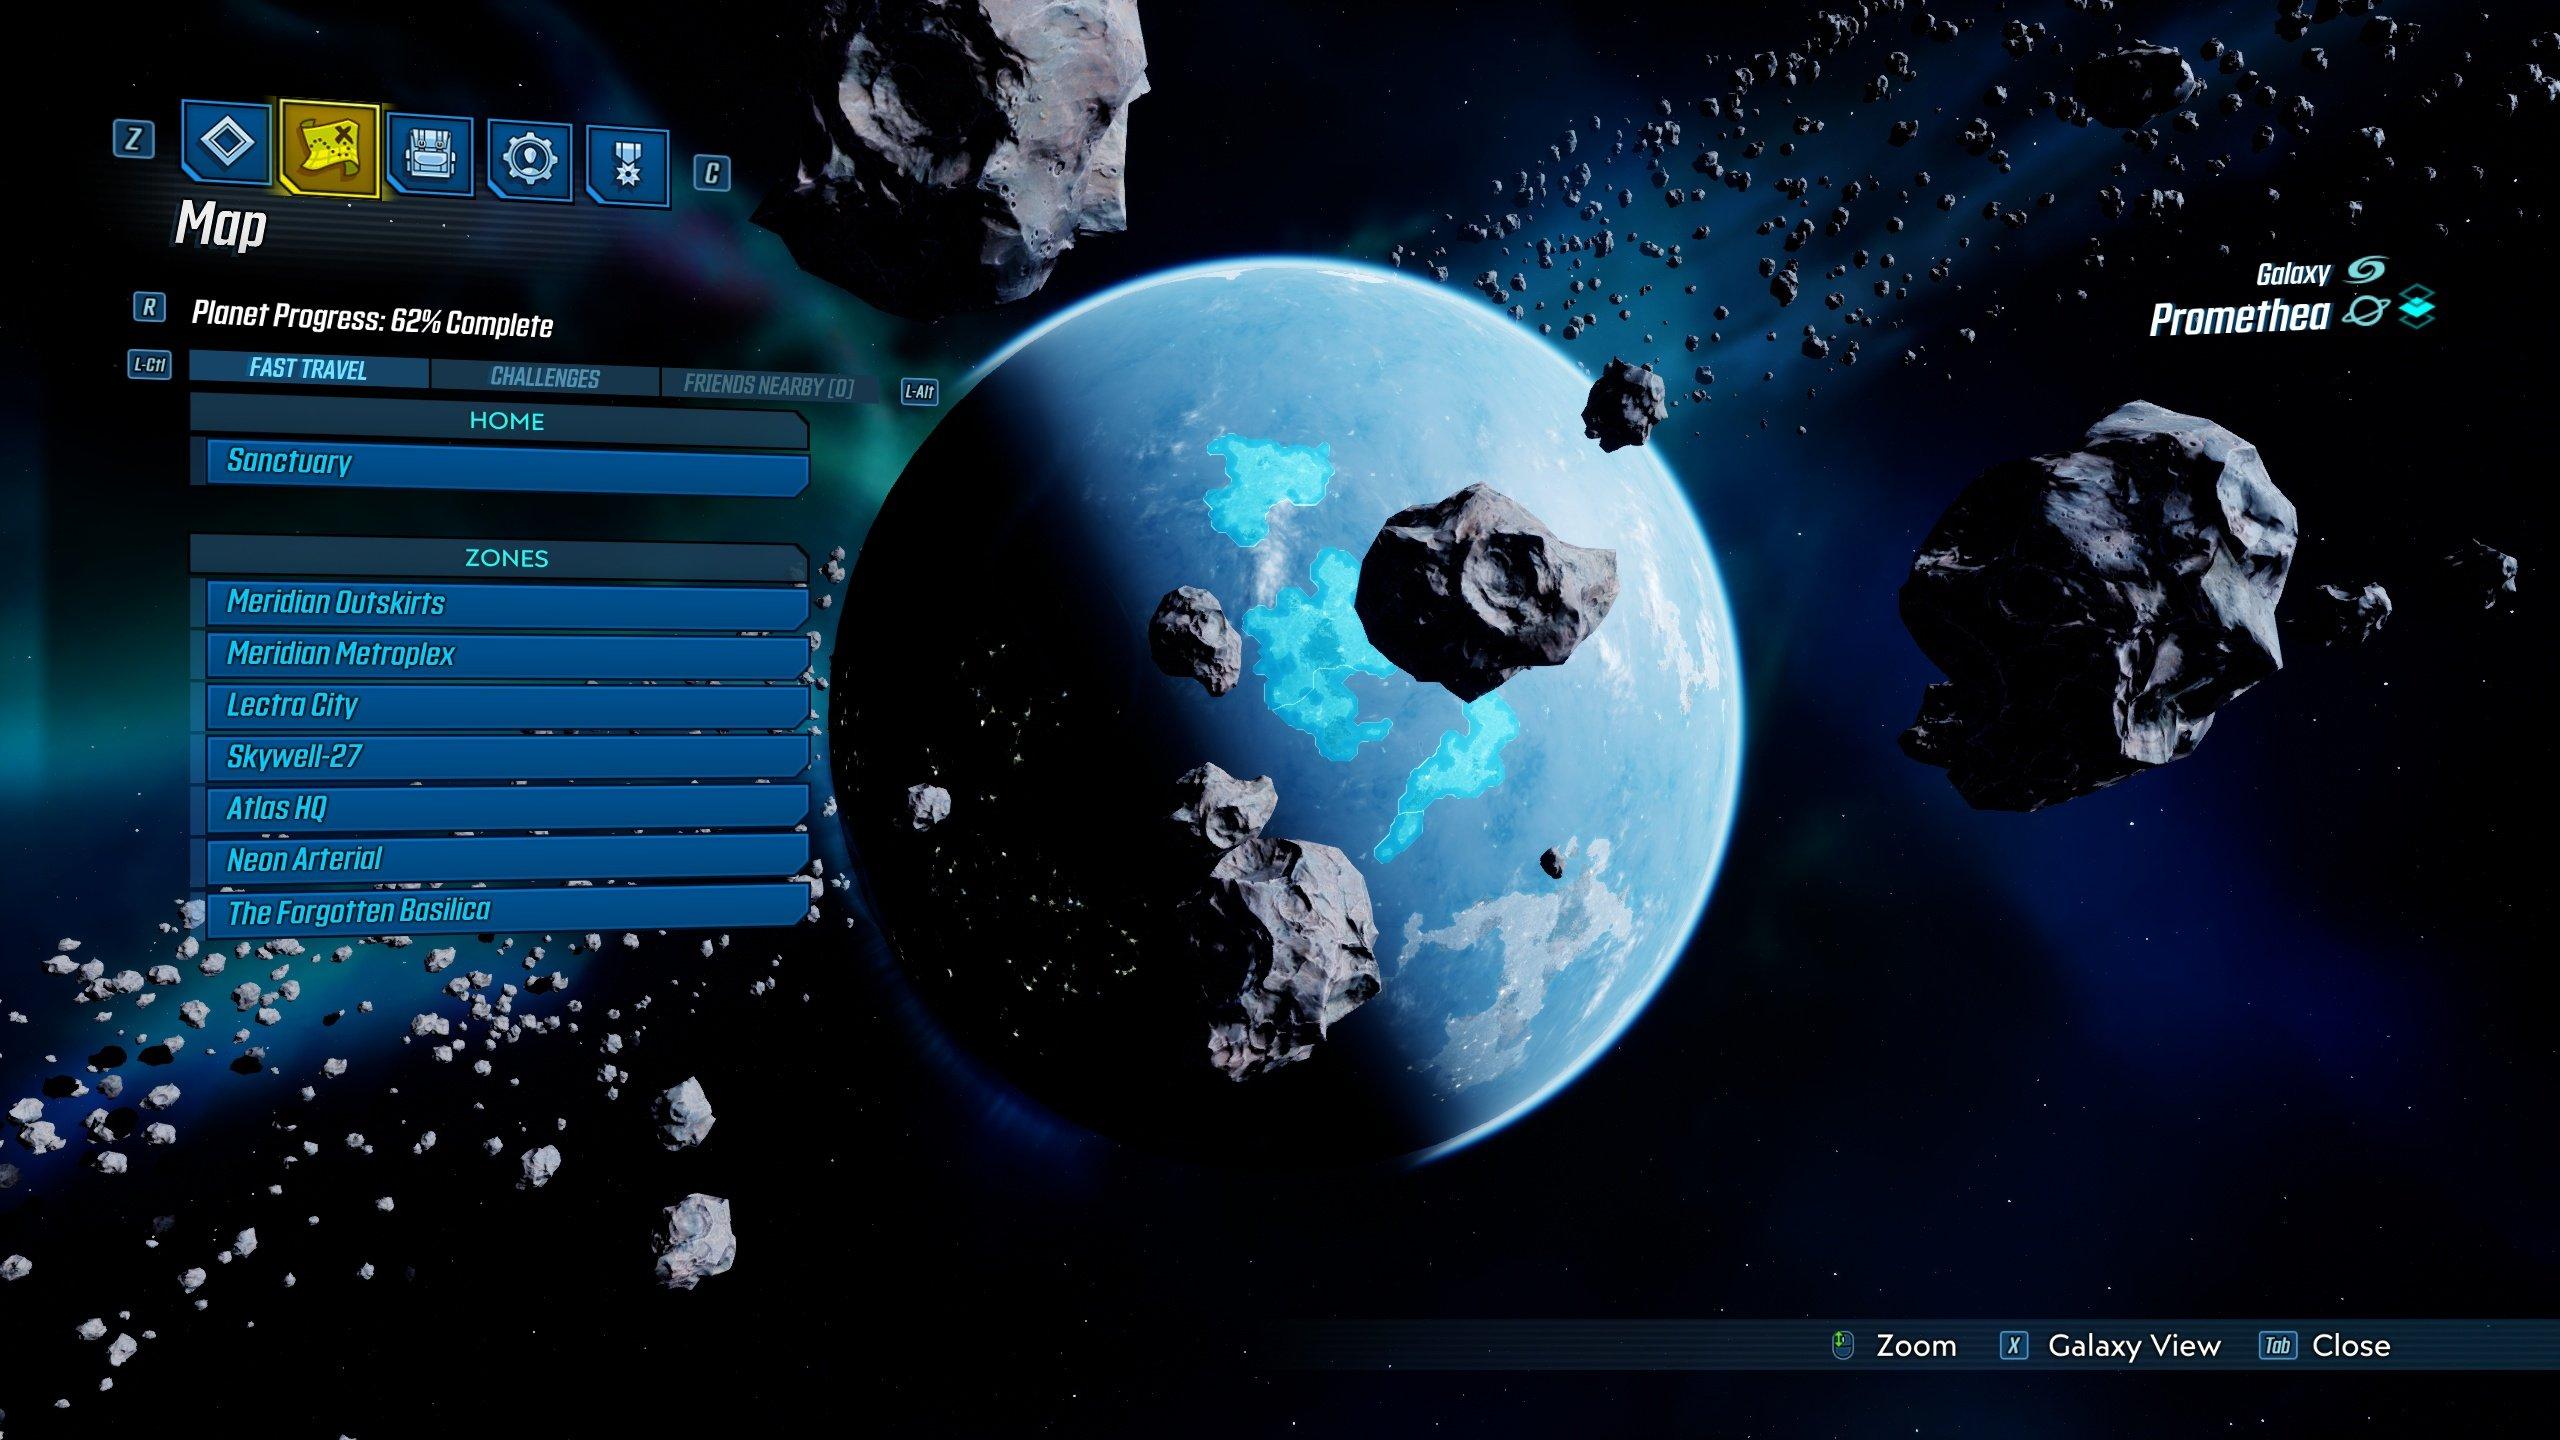 Borderlands 3 Promethea side missions